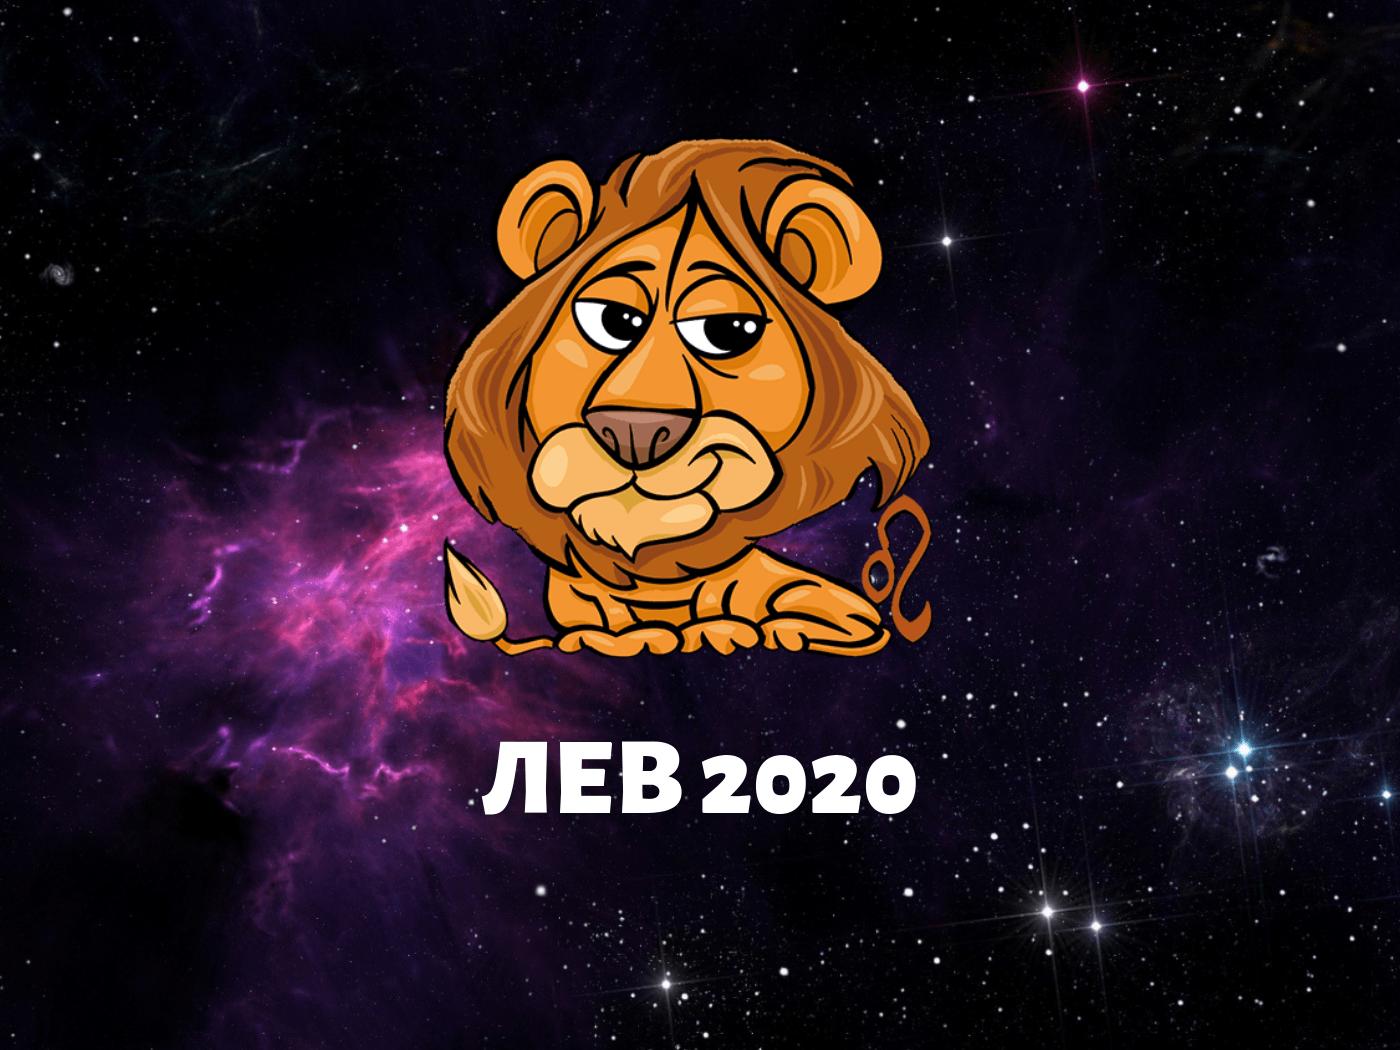 Гороскоп на 2020 год Лев